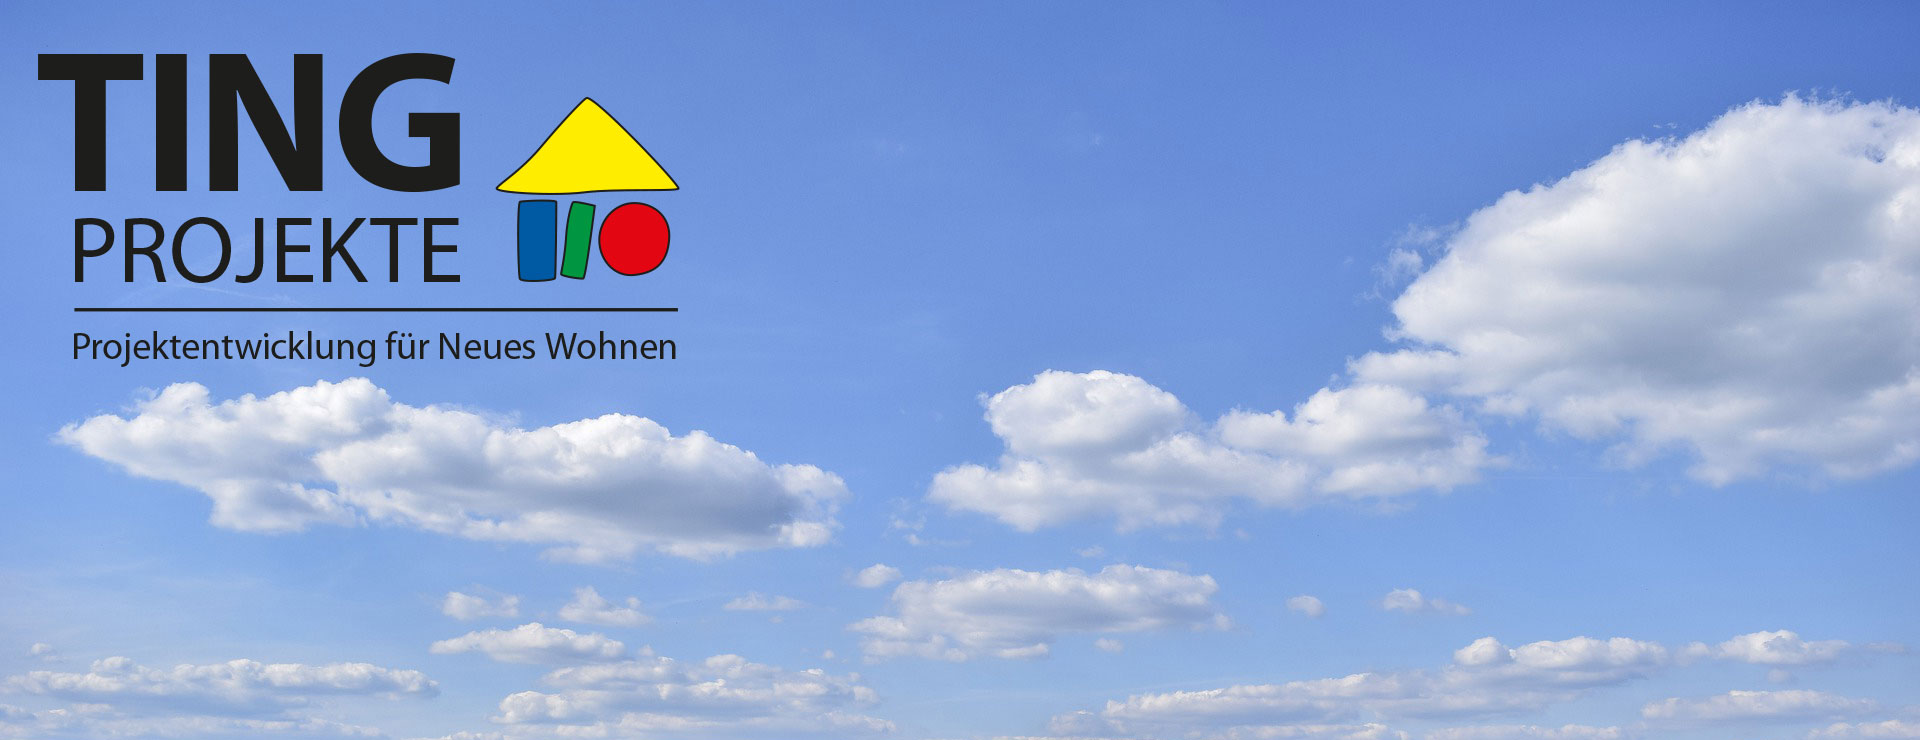 Logo TING Projekte